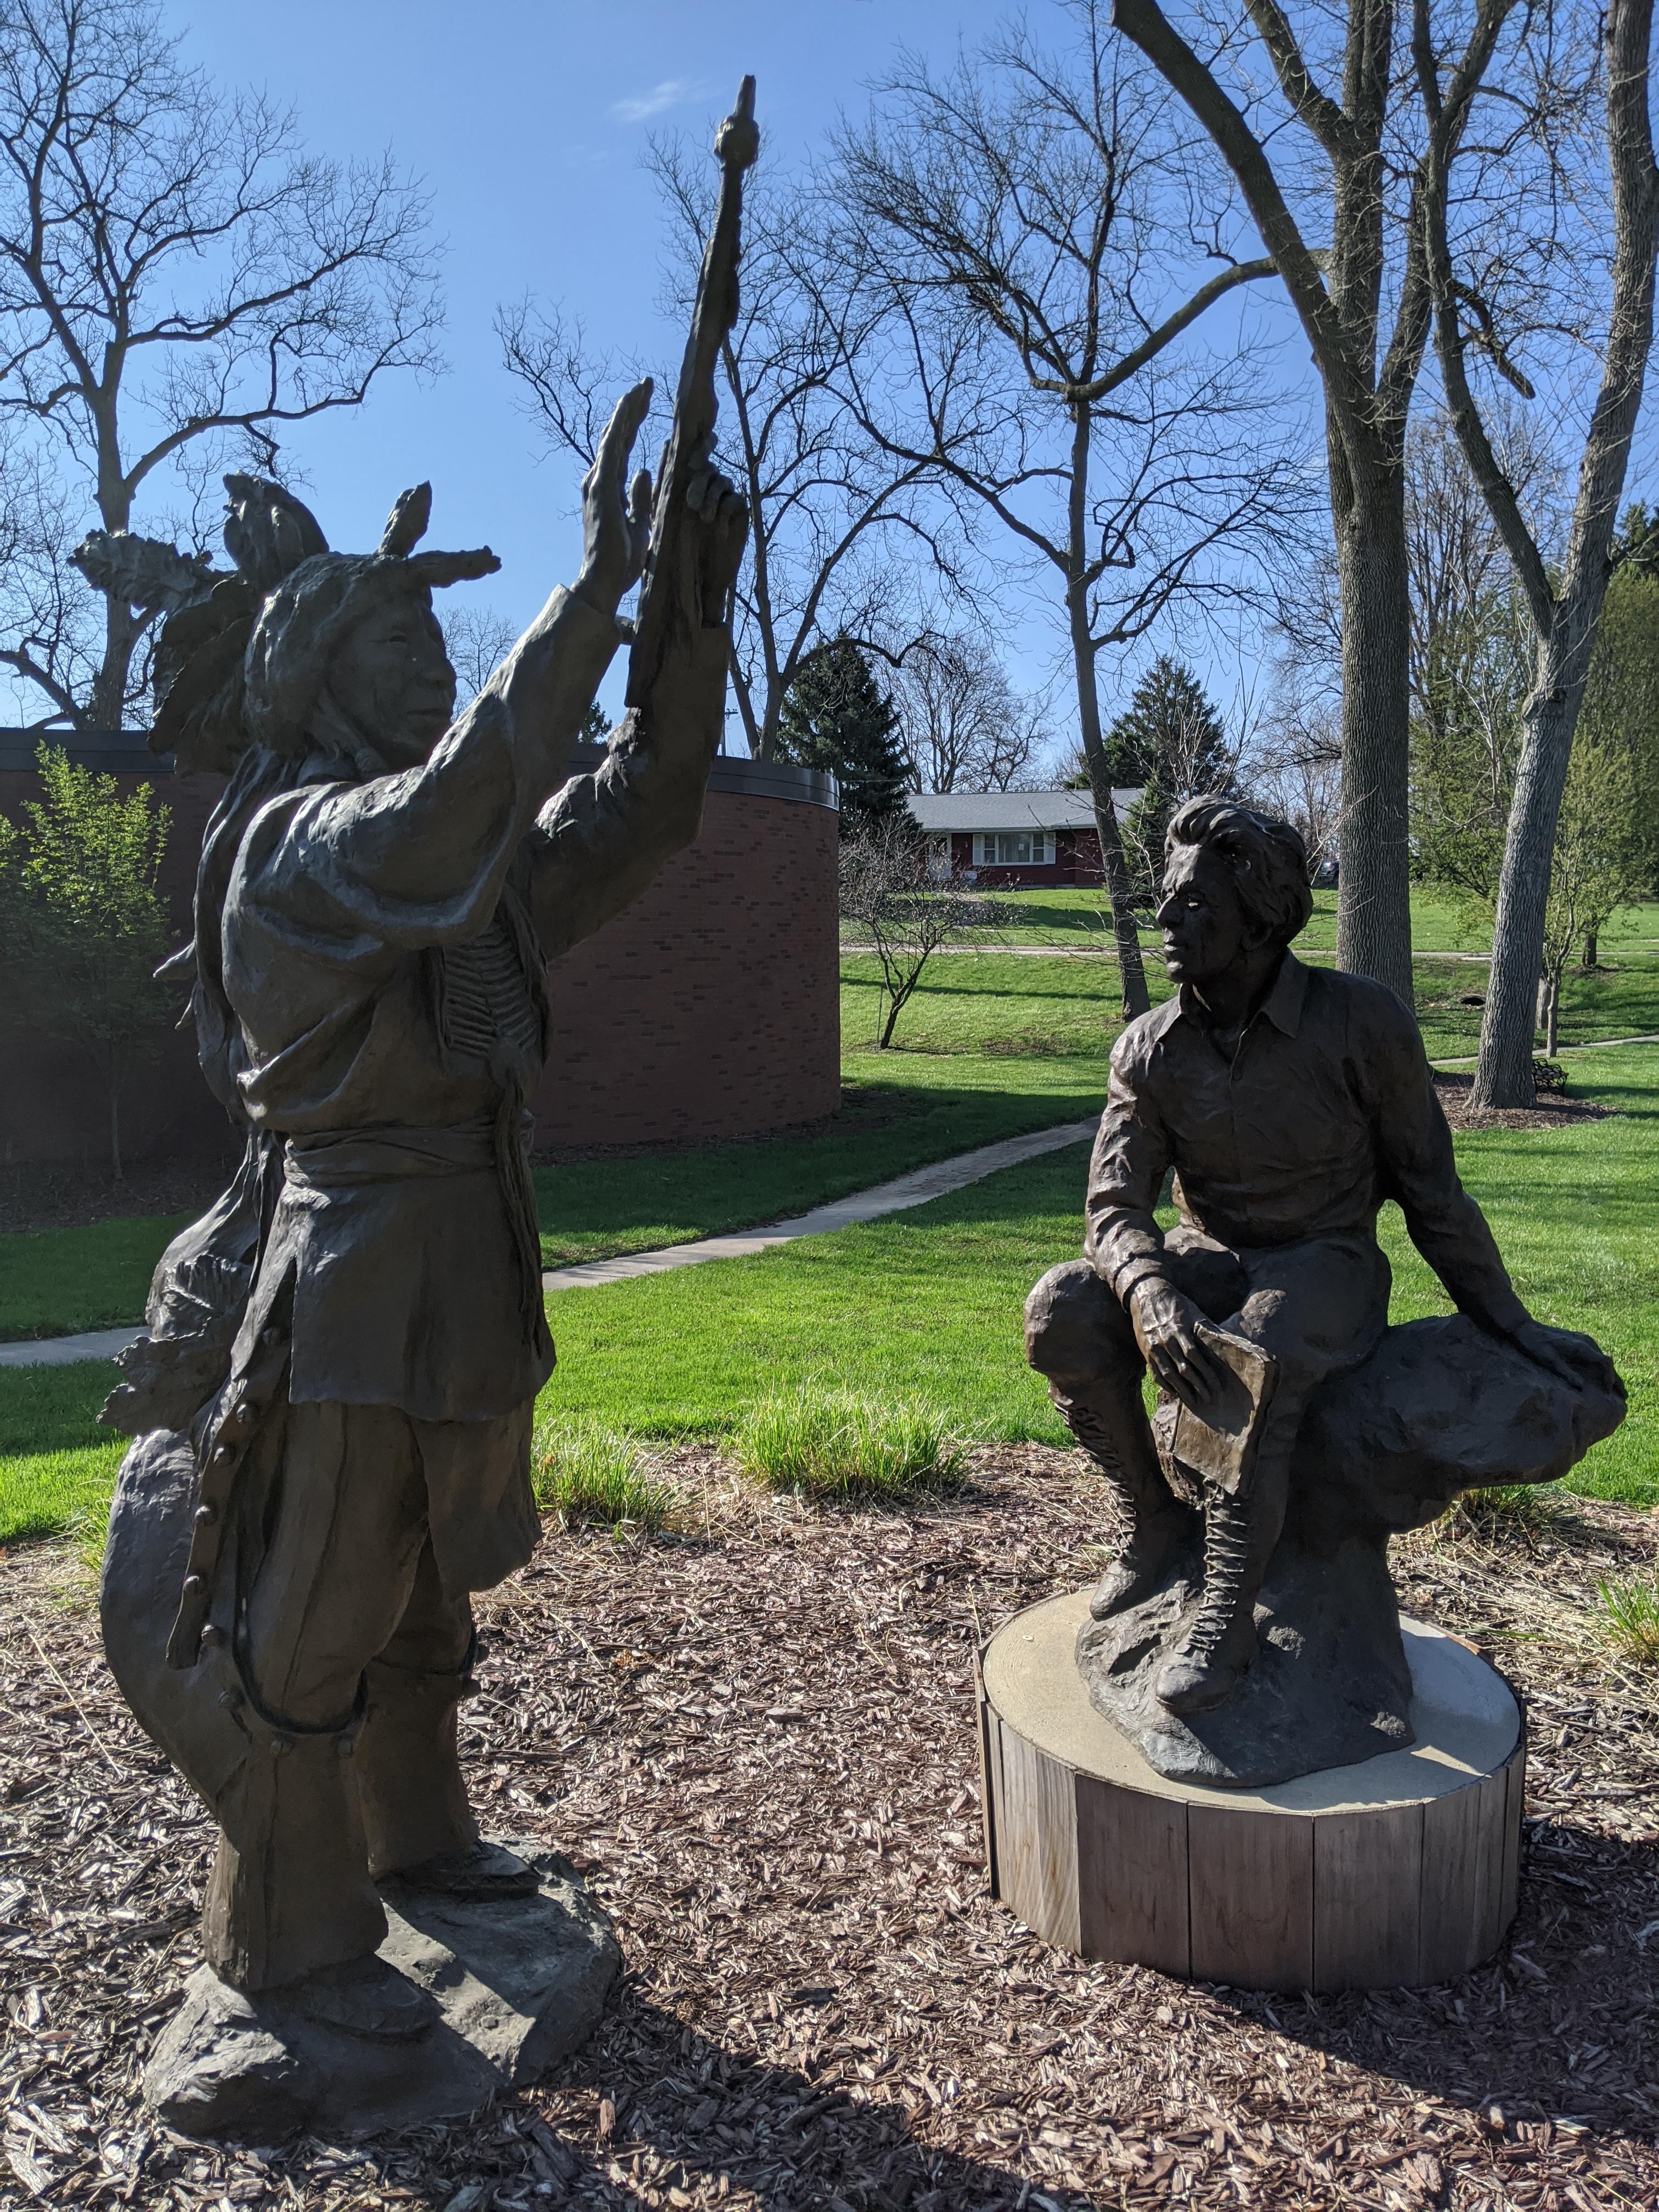 Statues of Neihardt and Black Elk